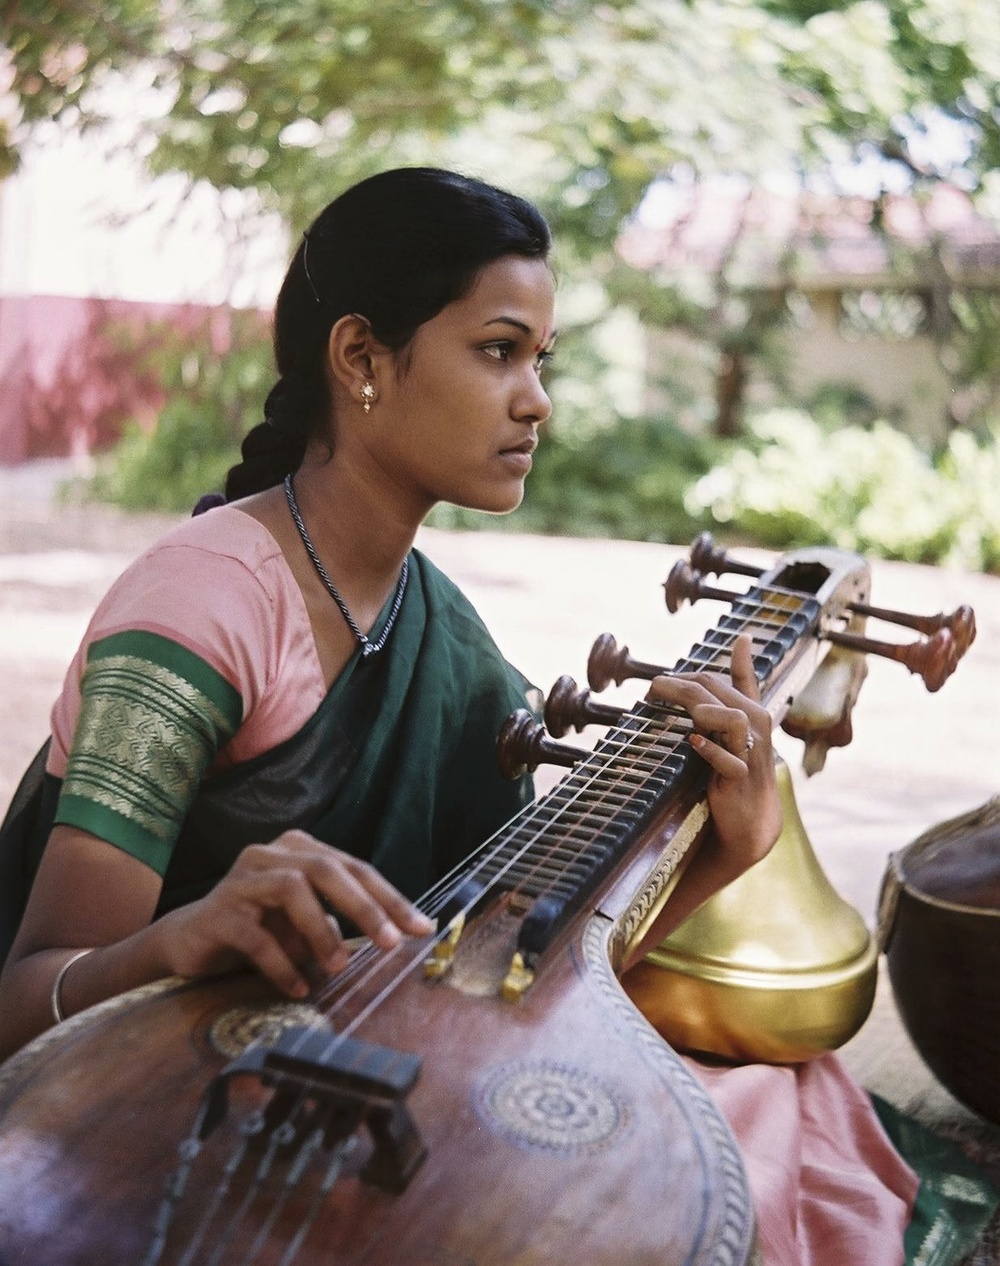 Veena class, Kalakshetra Foundation, Chennai, 2003© Sébastien Pierre